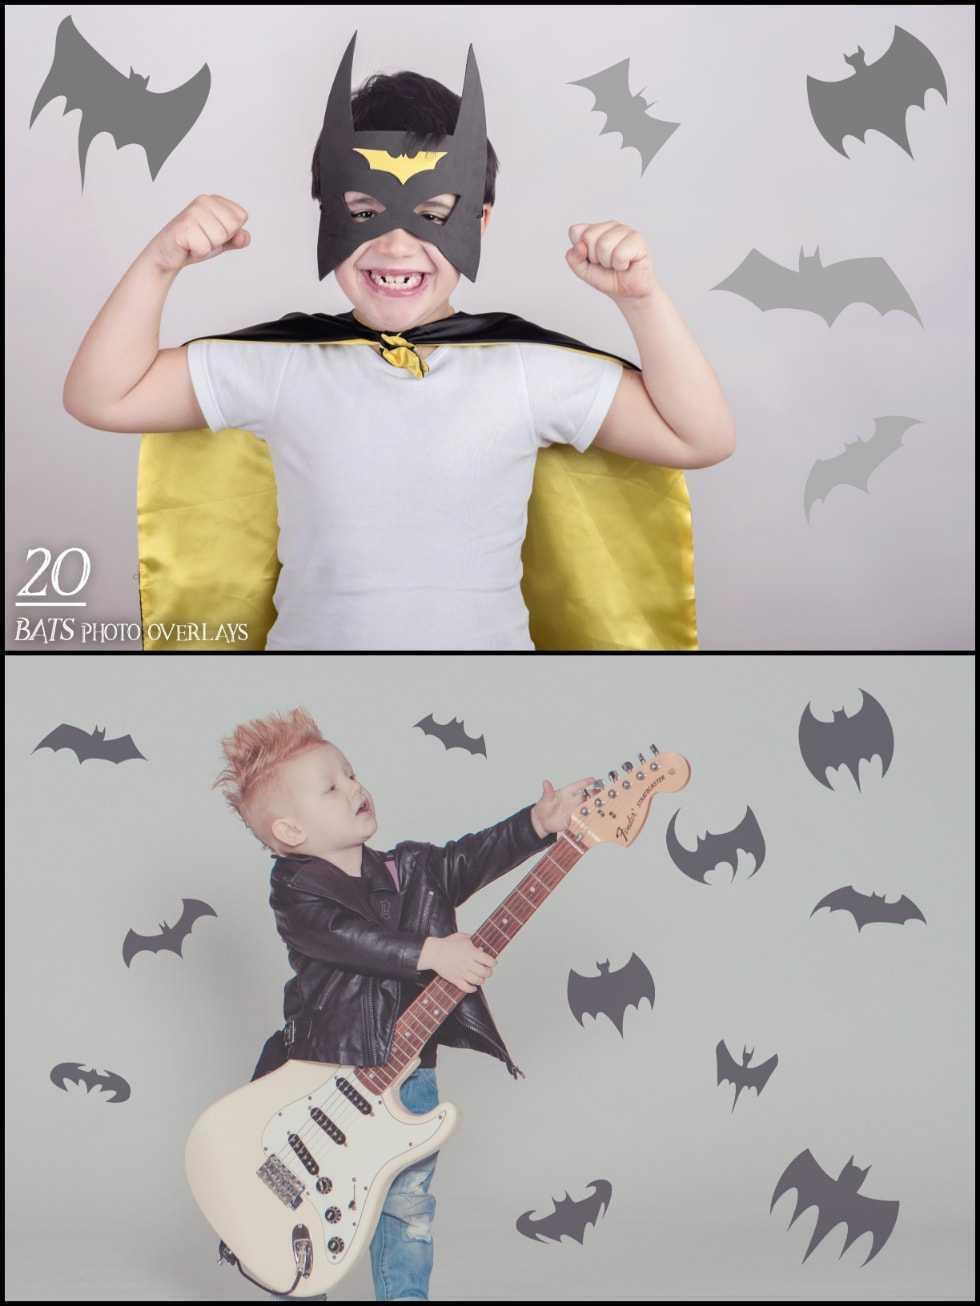 1260+ Halloween Photo Overlays Screenshot 11